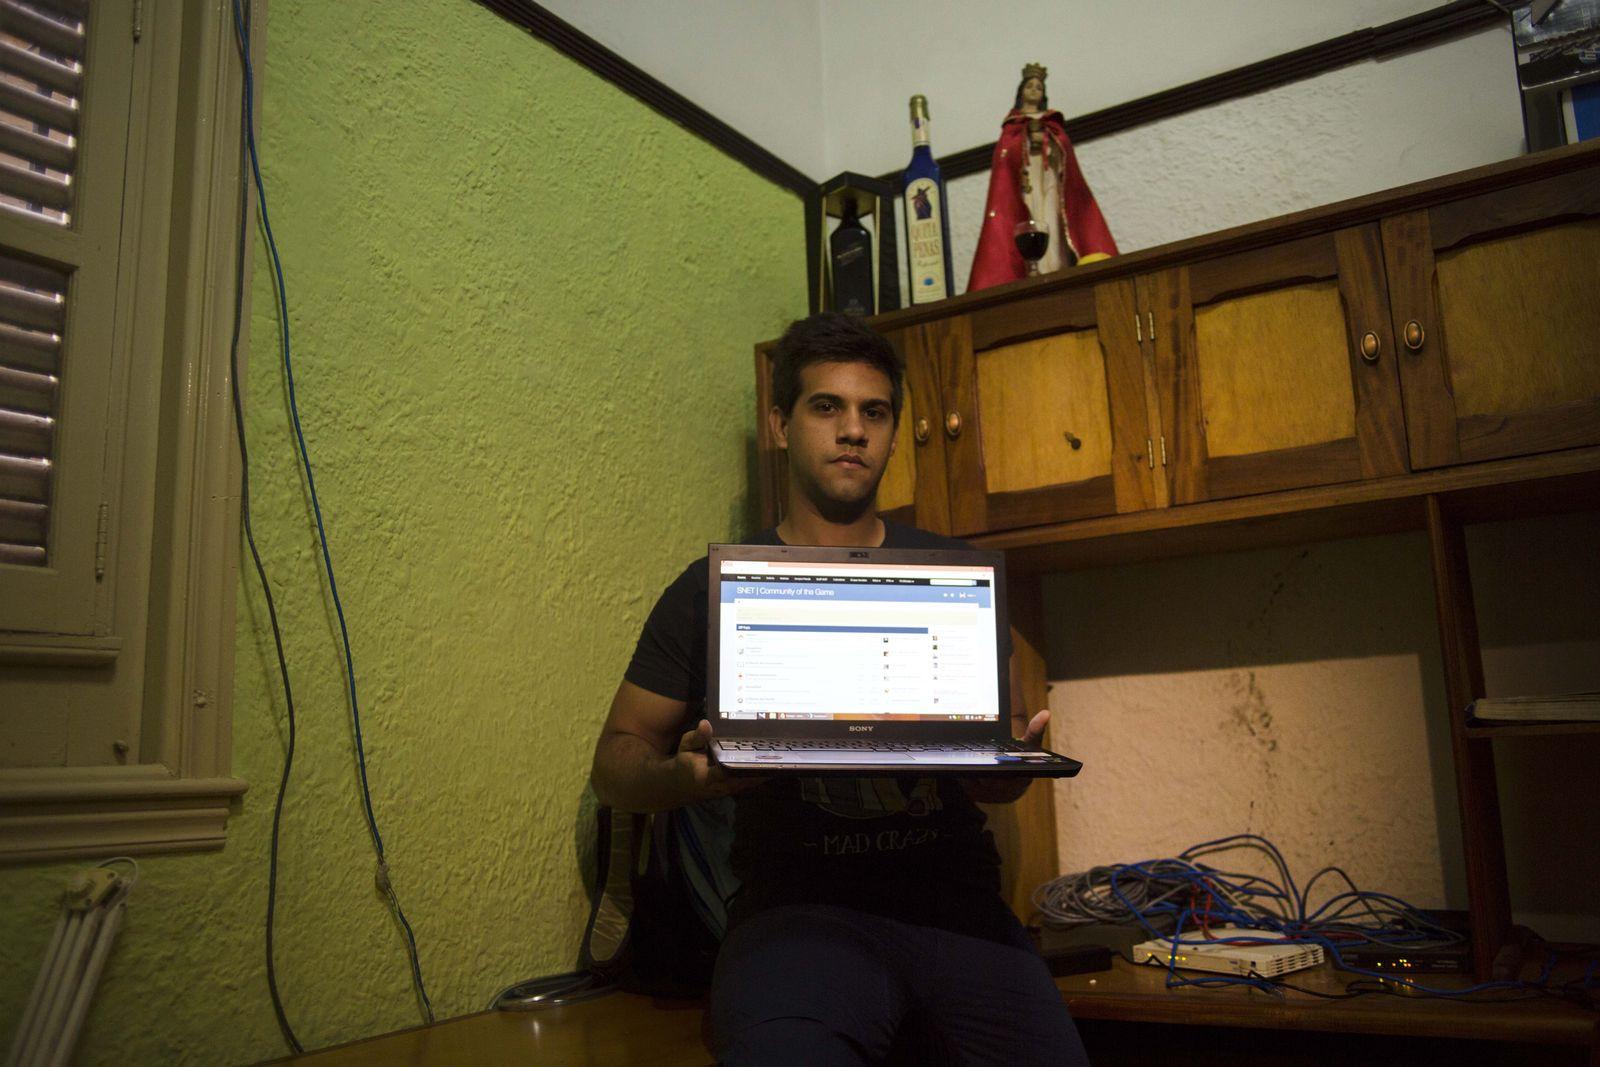 Cuba/ Computernetzwerk/ Rafael Antonio Broche Moreno